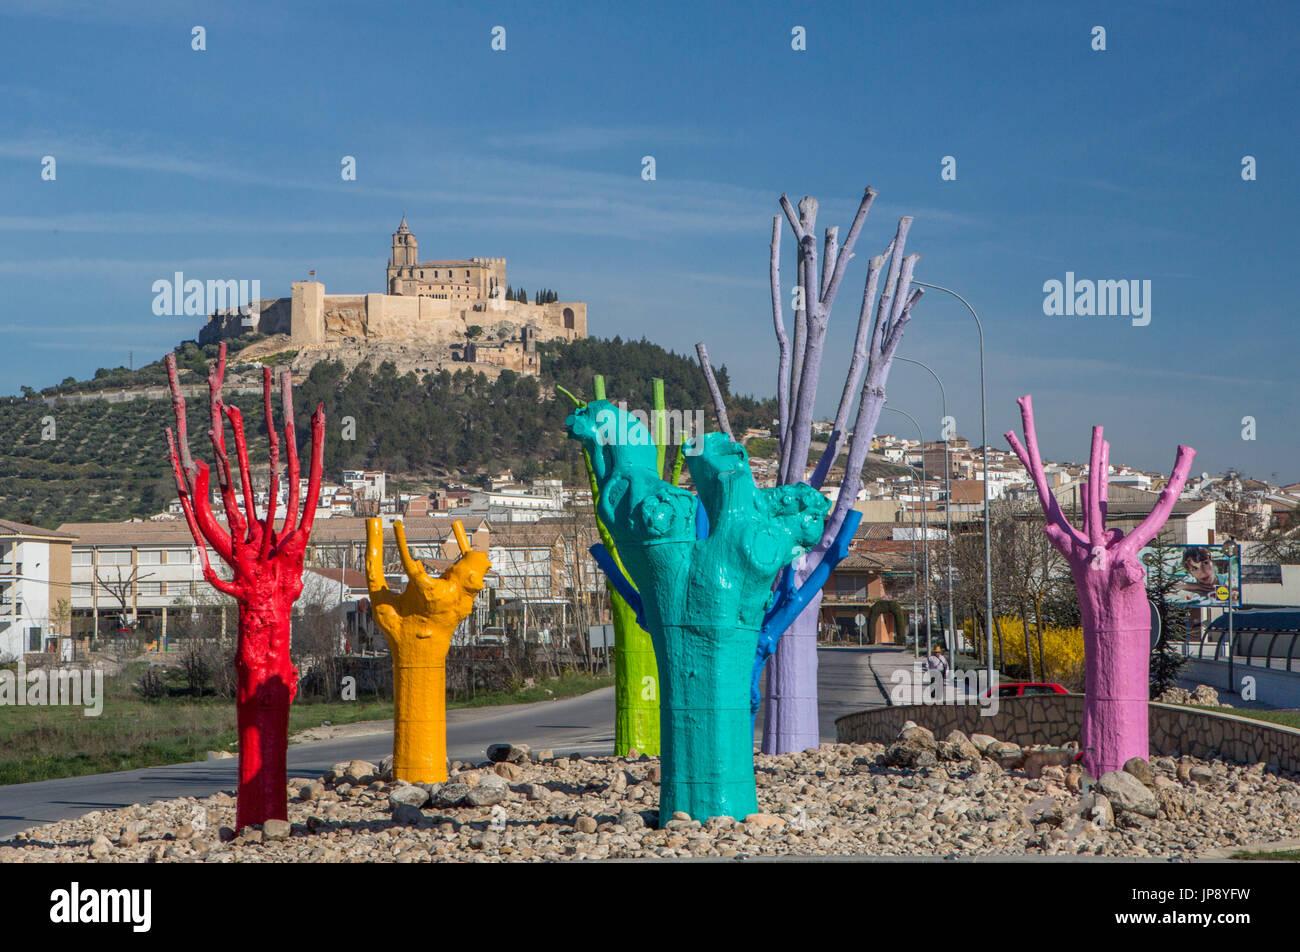 Spain, Andalucia Region, Jaen Province, Alcaudete City, Alcaudete Castle - Stock Image